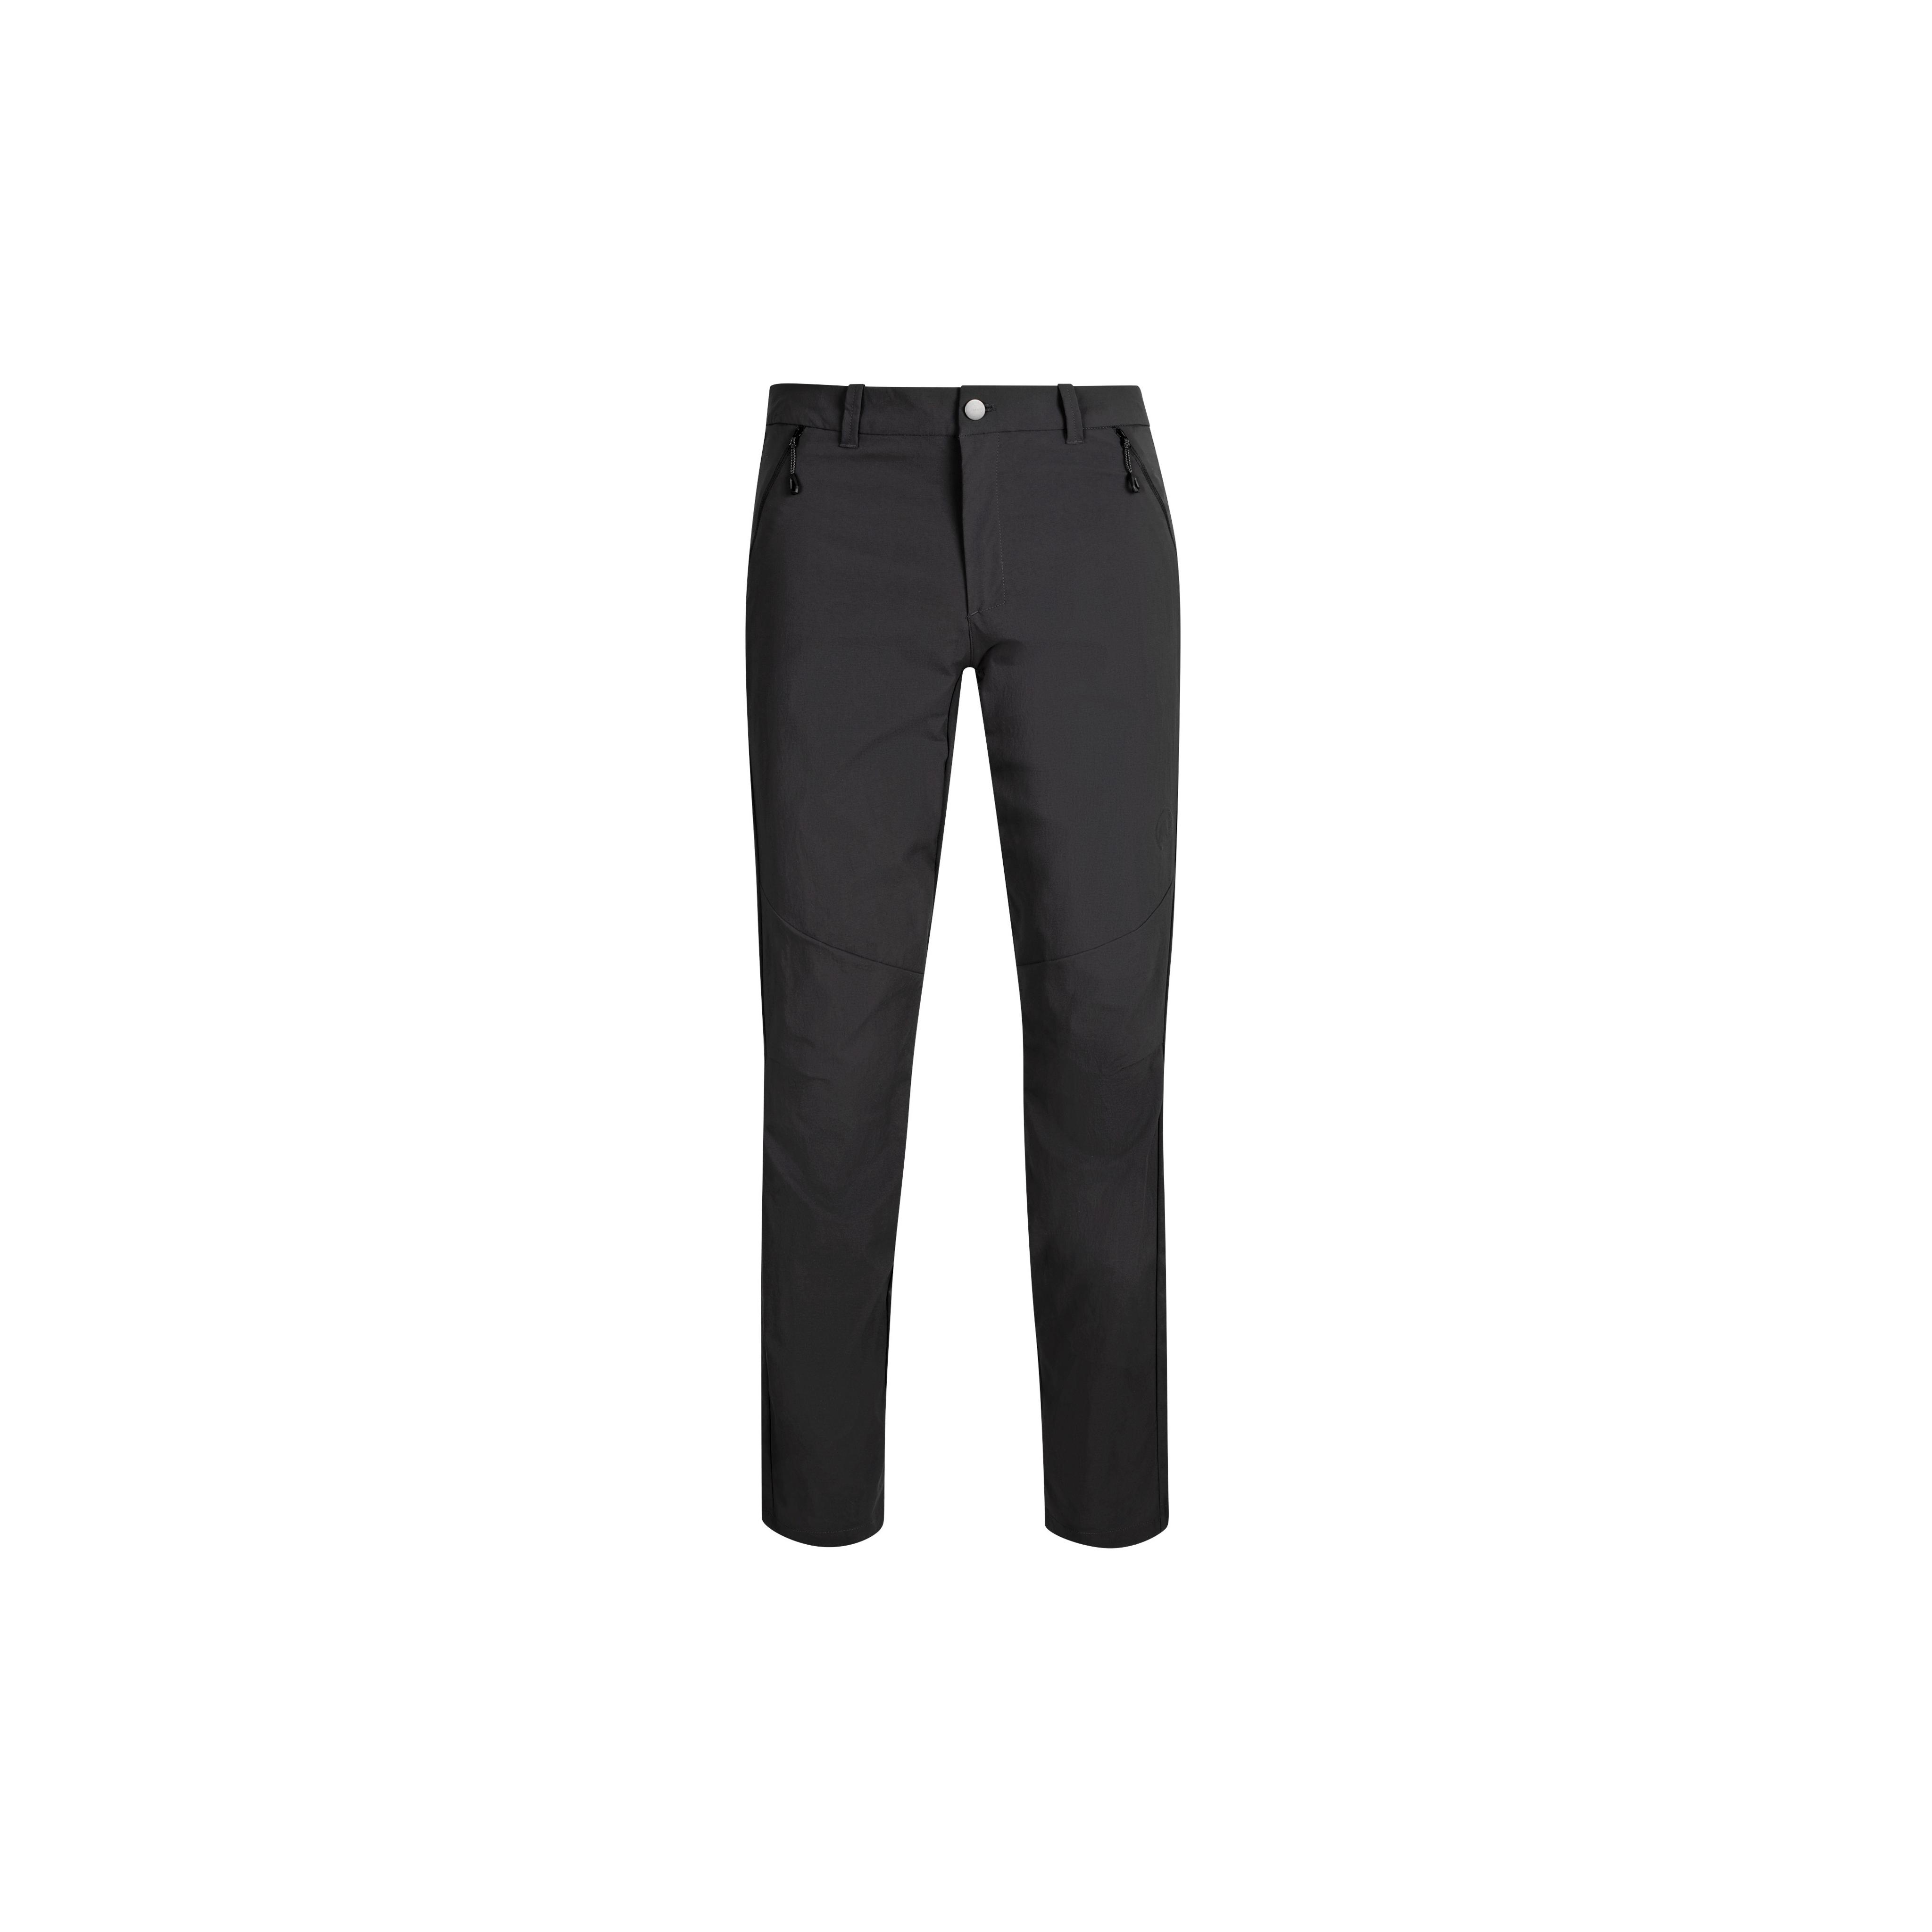 Hiking Pants Men - black, normal, UK 28 thumbnail